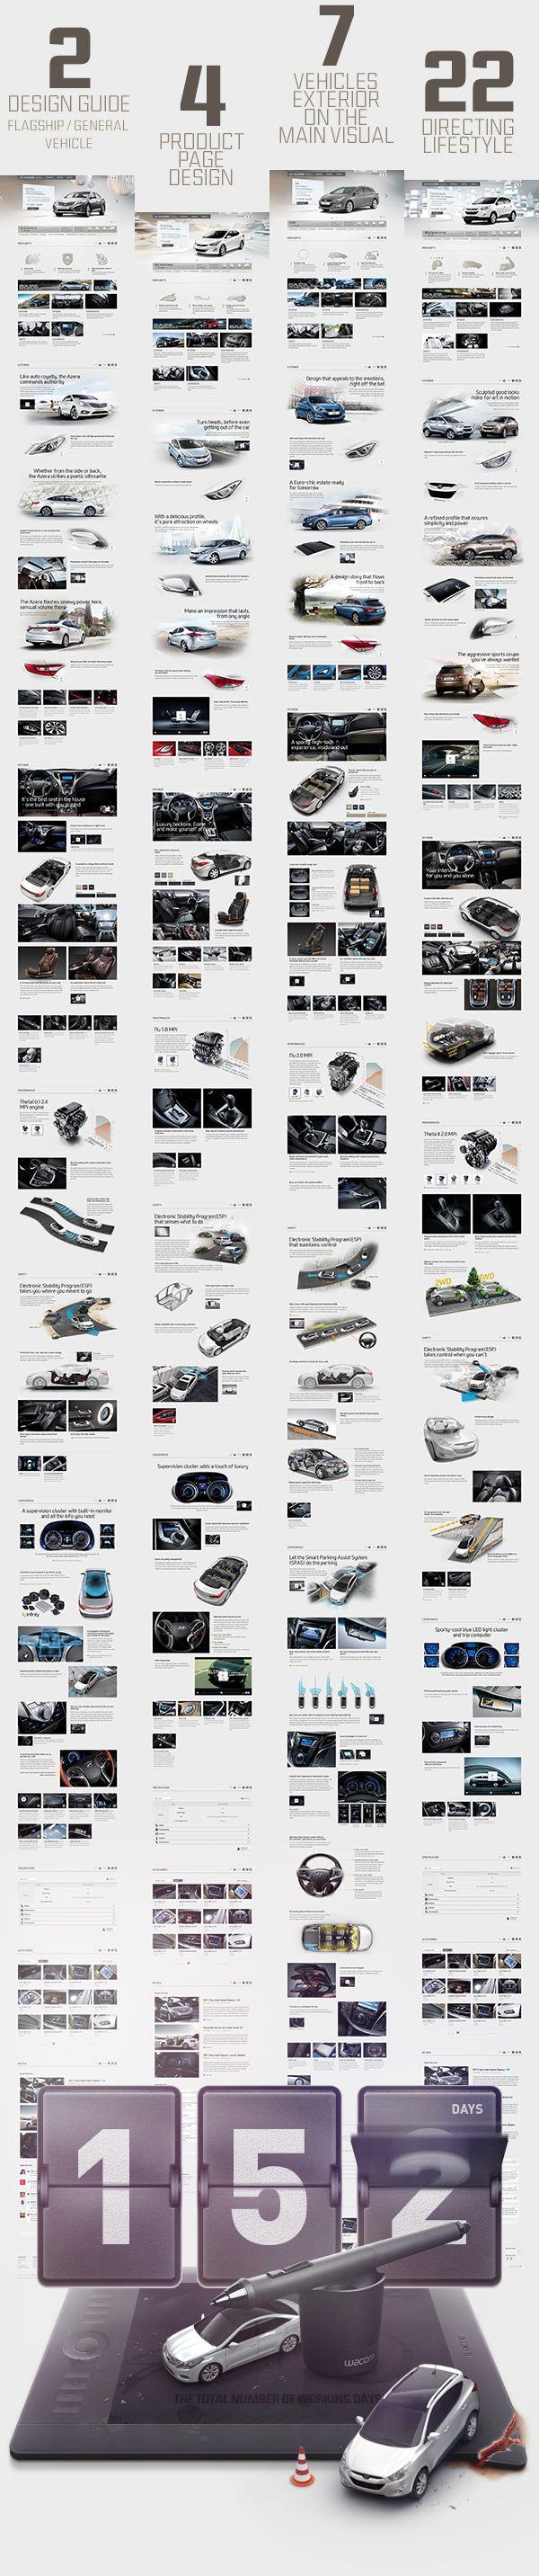 Hyundai Motor - Showroom Product Page (design guide) by Soongyu Gwon, via Behance